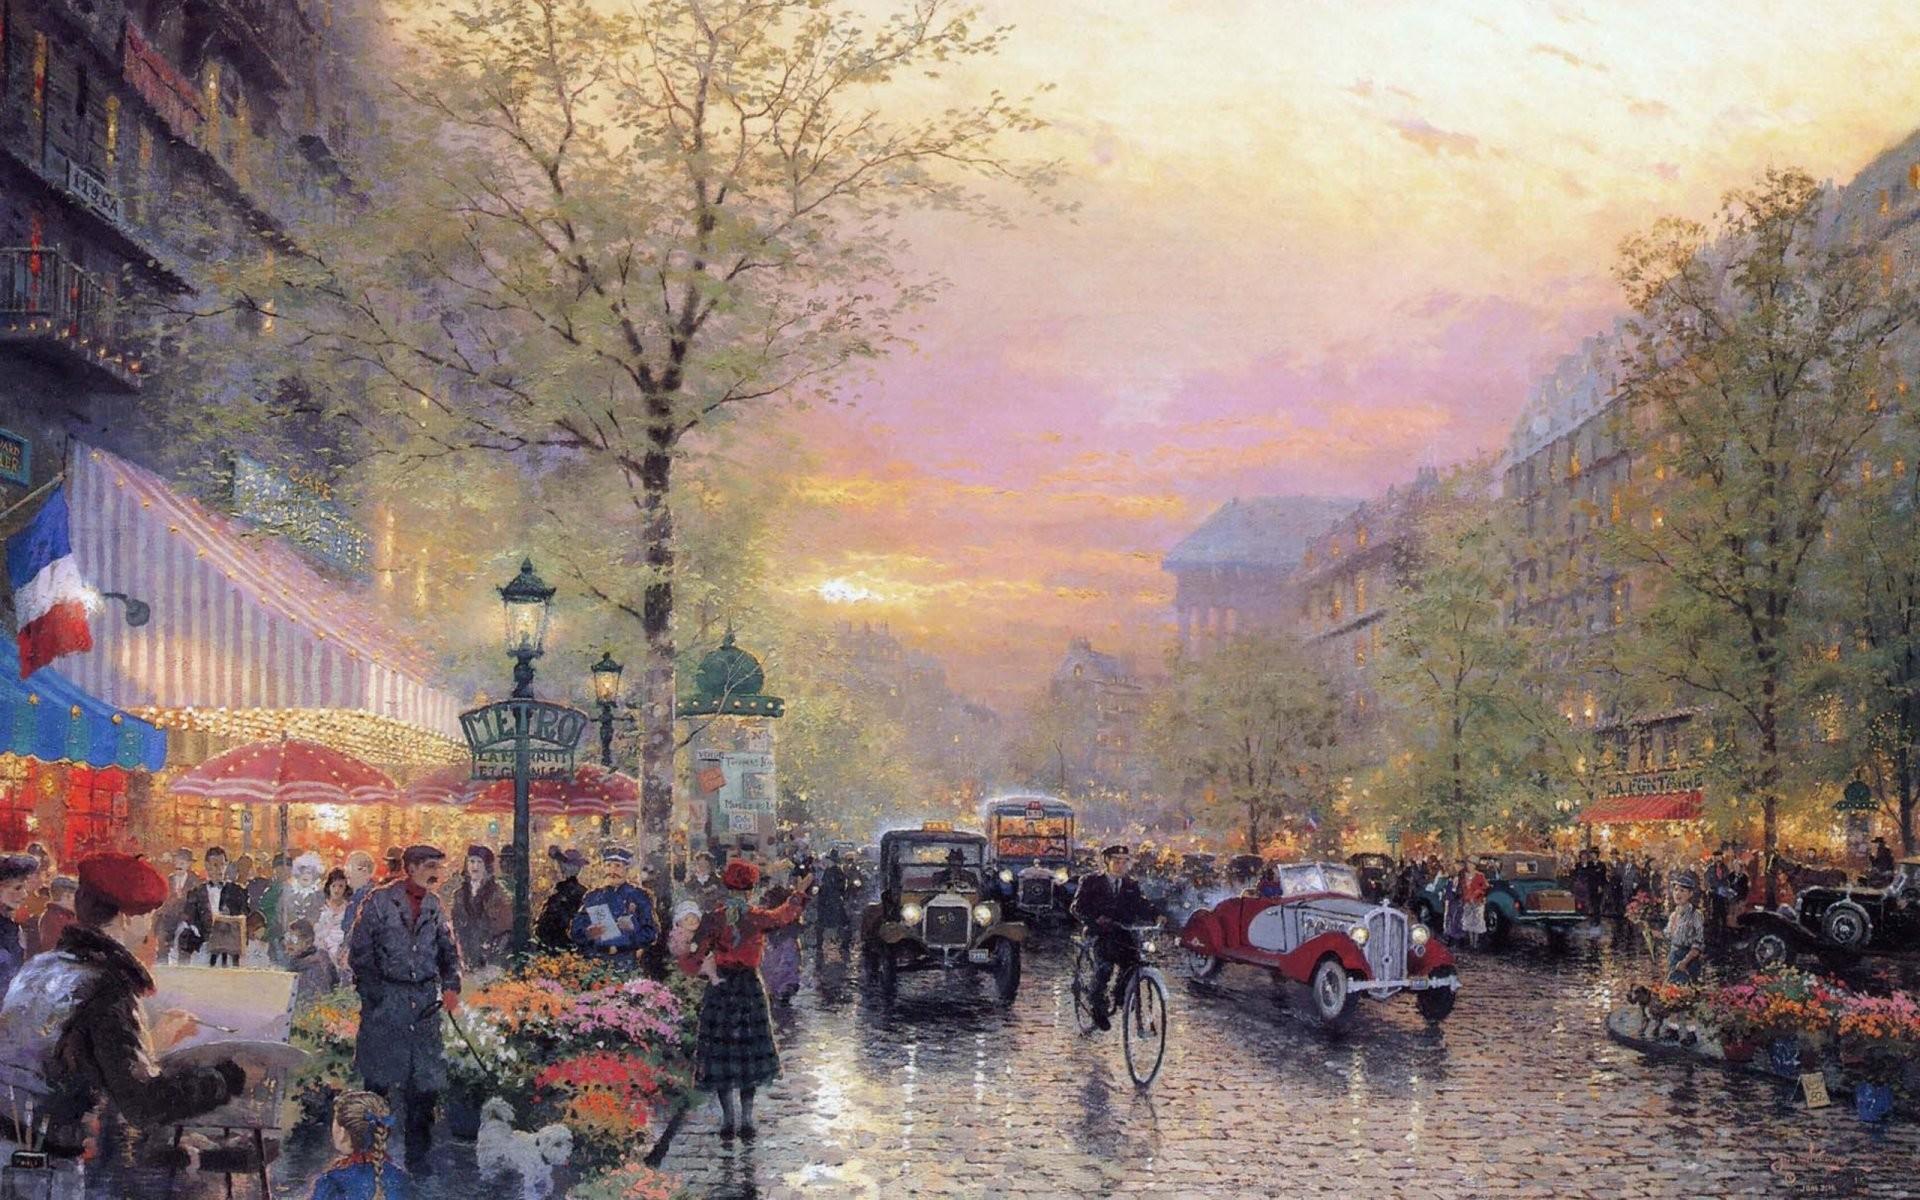 Res: 1920x1200, paris city of lights le boulevard des lumieres at dusk thomas kinkade art  painting france city